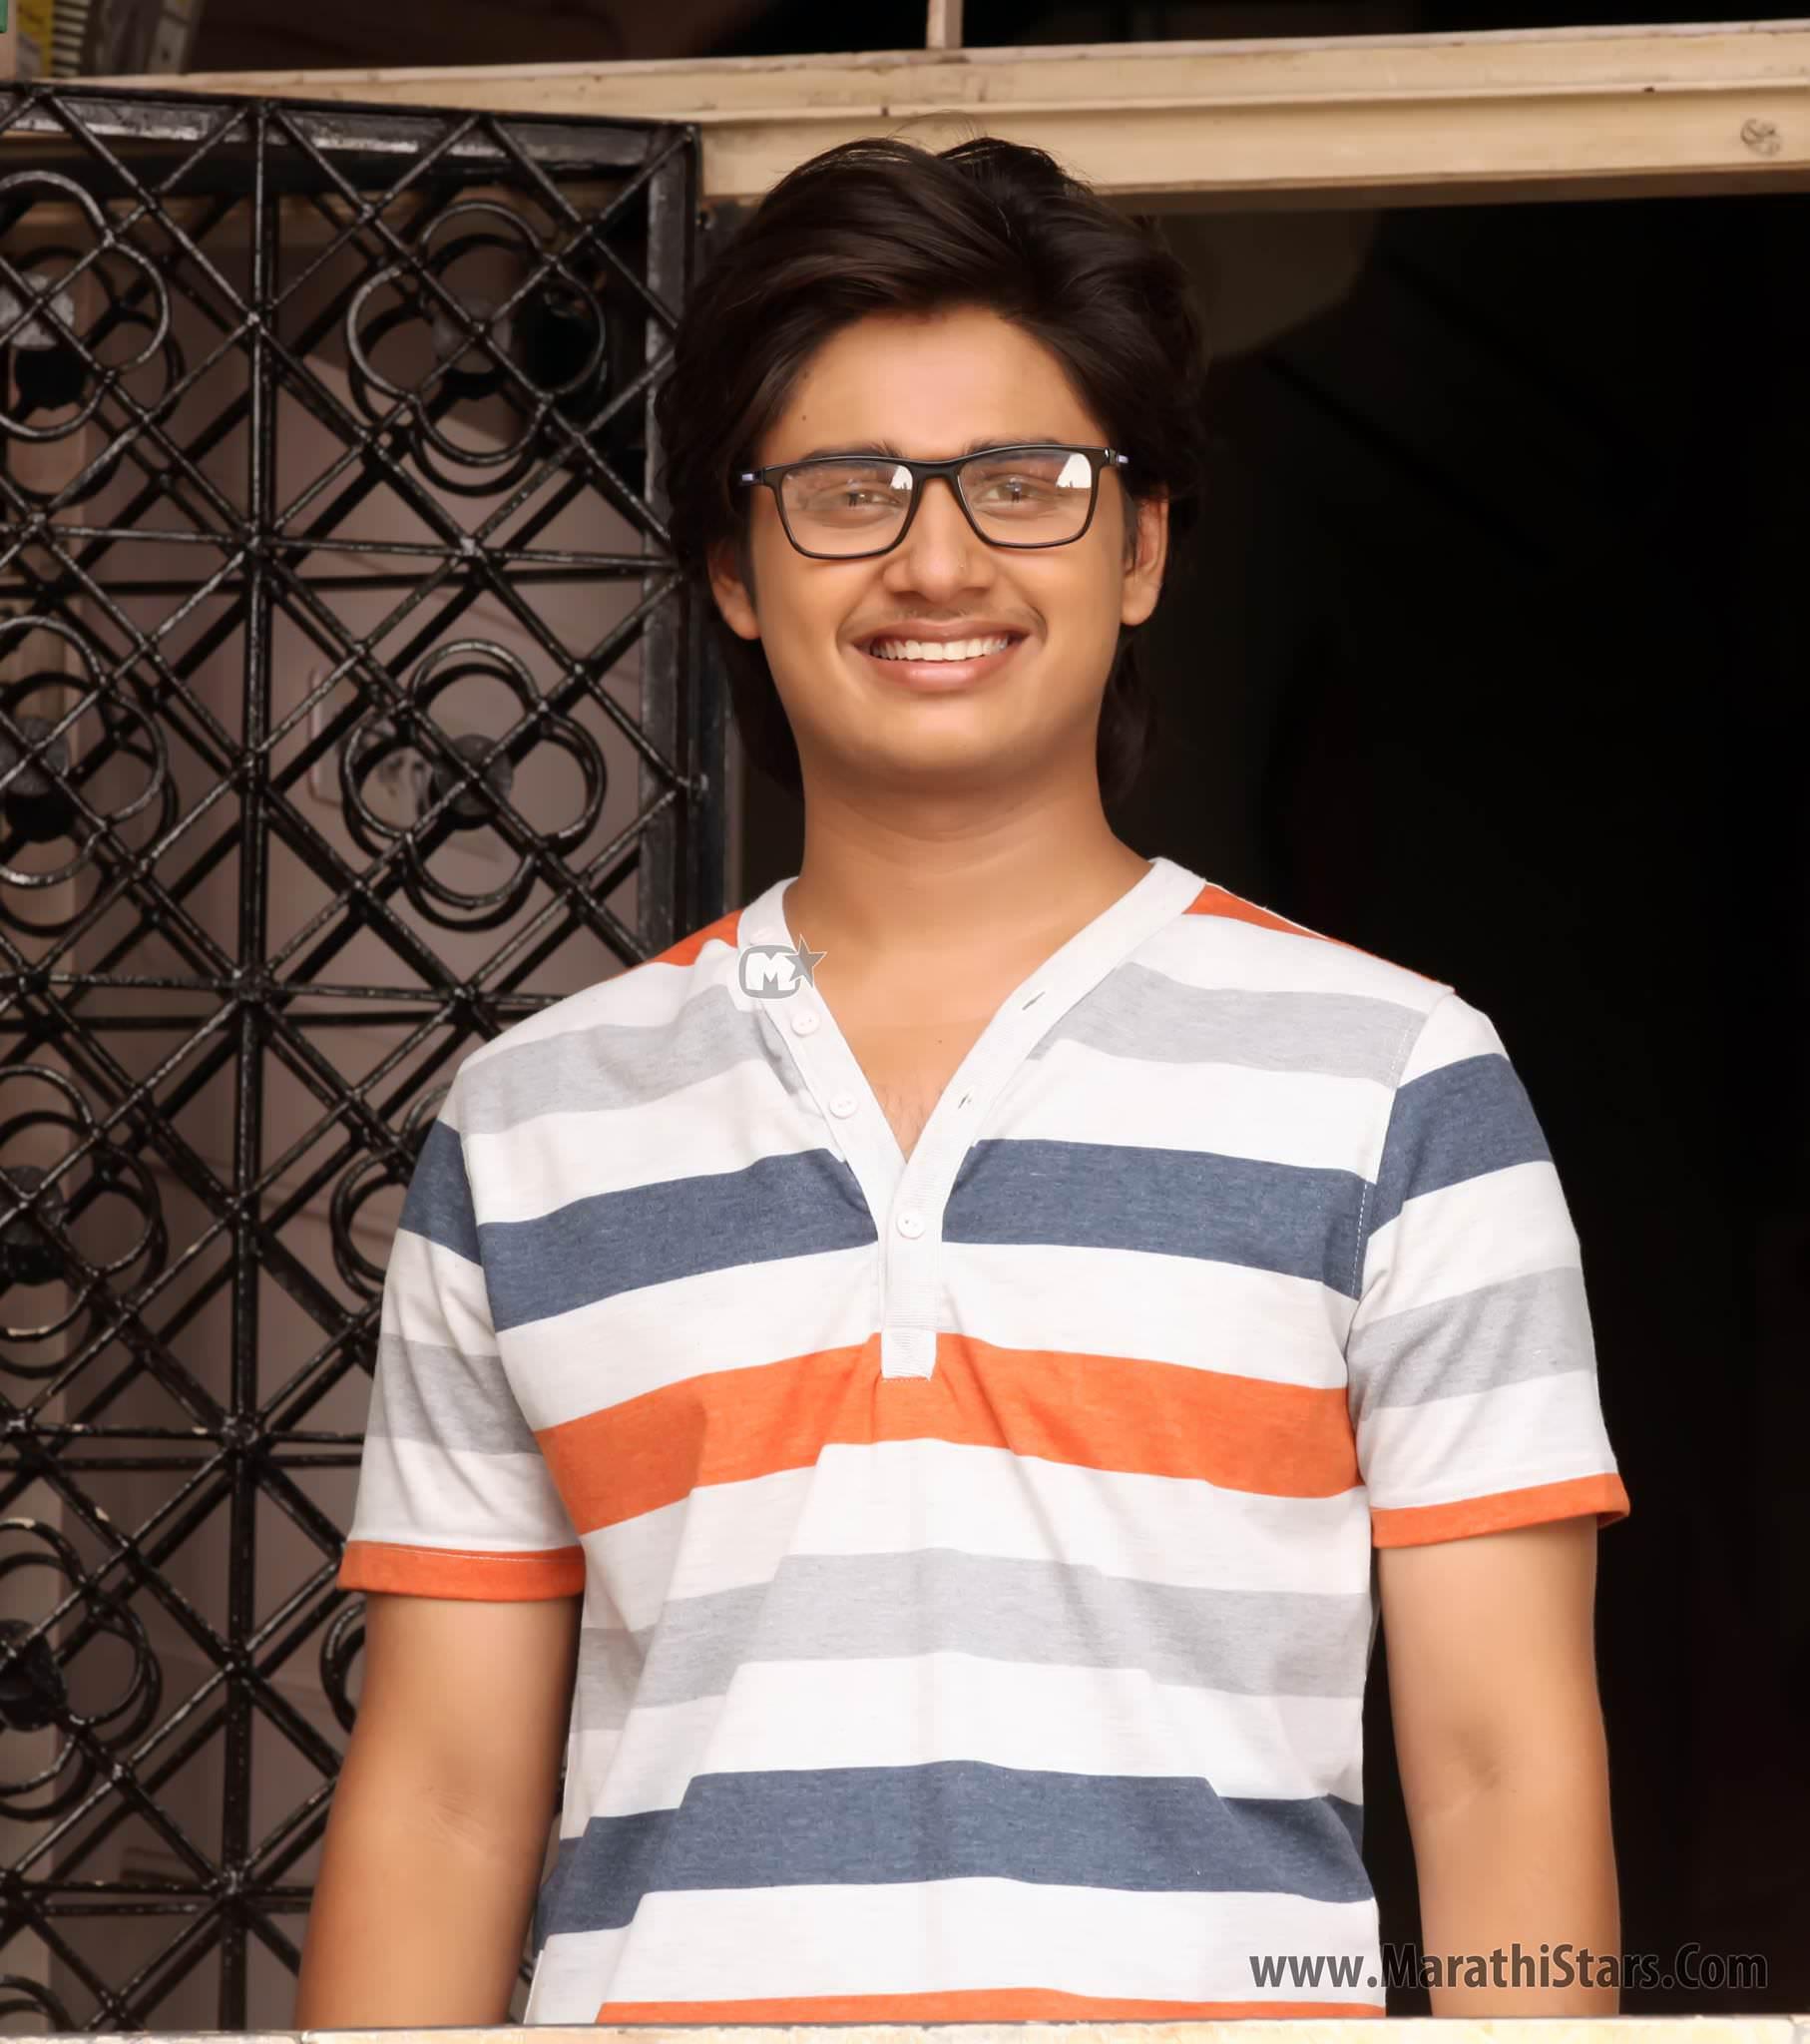 Abhinay Berde Marathi Actor Laxmikant Berde Photos Bio ... Laxmikant Berde Abhinay Berde